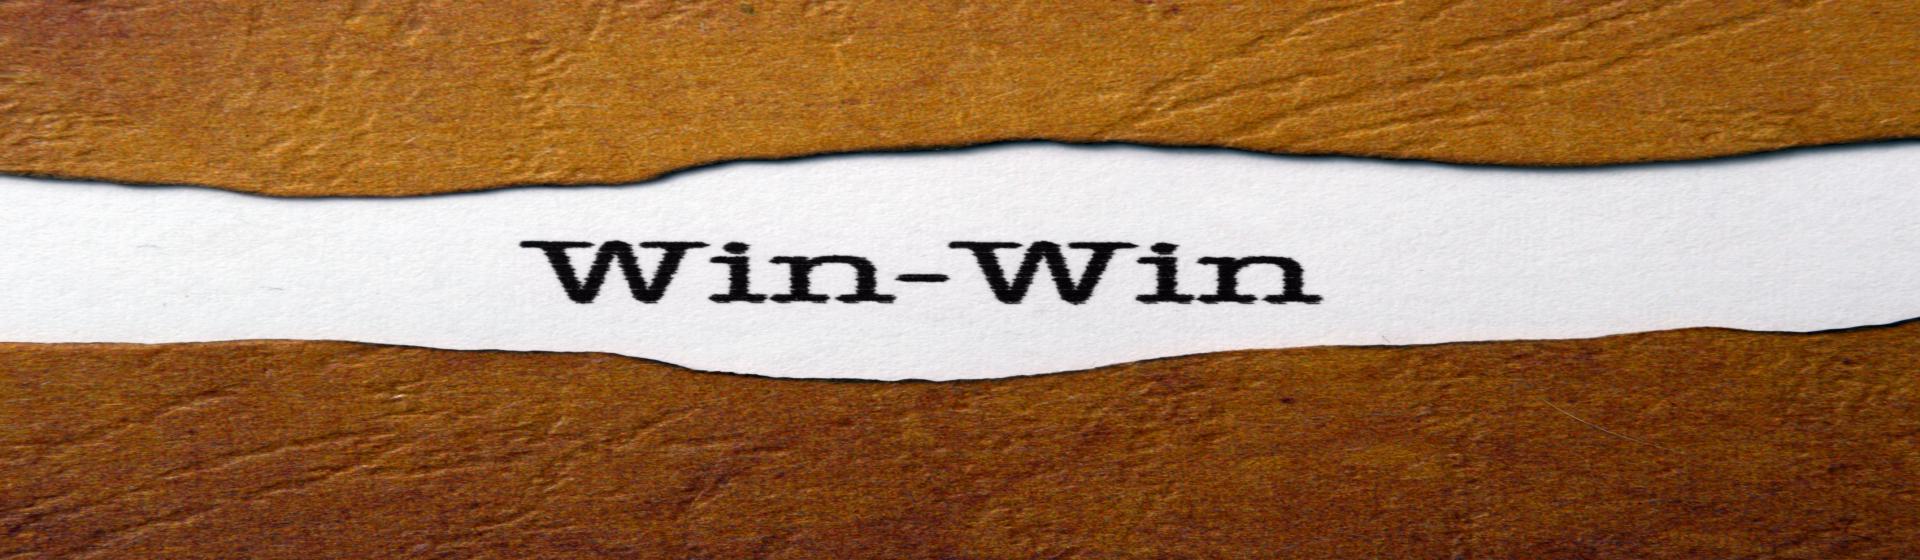 Win win z1cecvvo